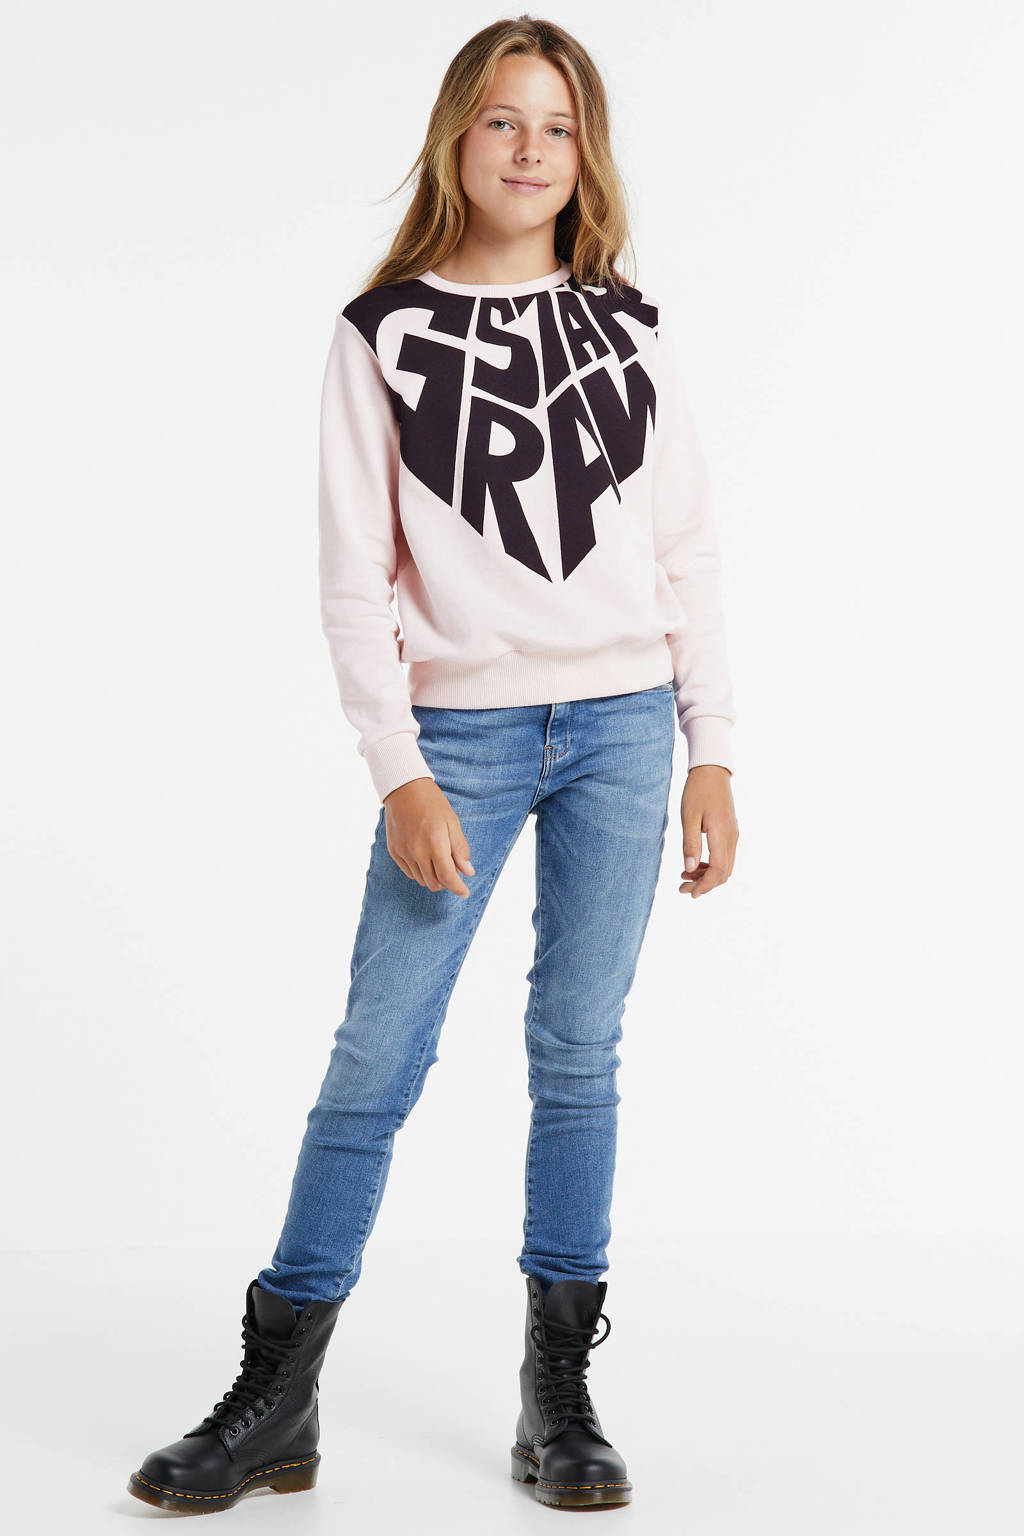 G-Star RAW sweater met logo pastelroze/donkerblauw, Pastelroze/donkerblauw